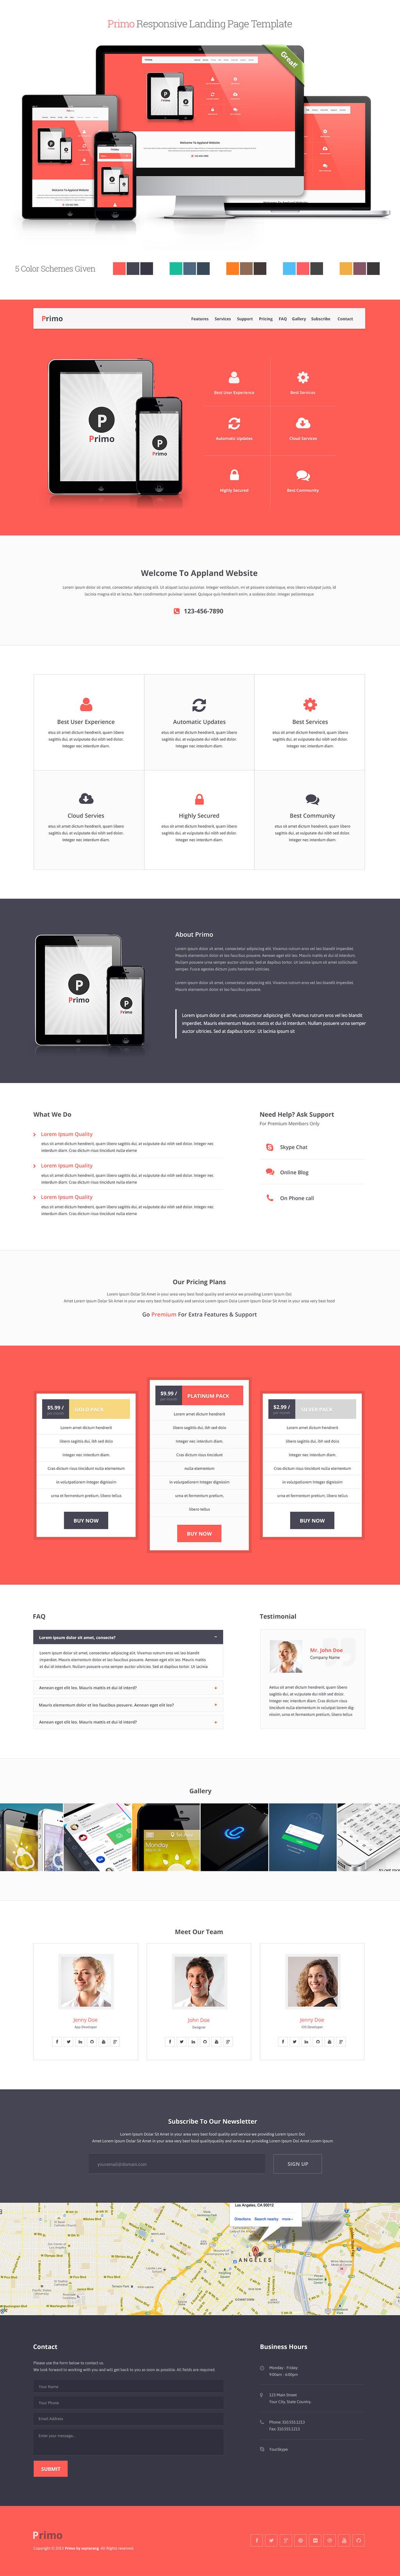 Primo Responsive Landing Page Template by Saptarang